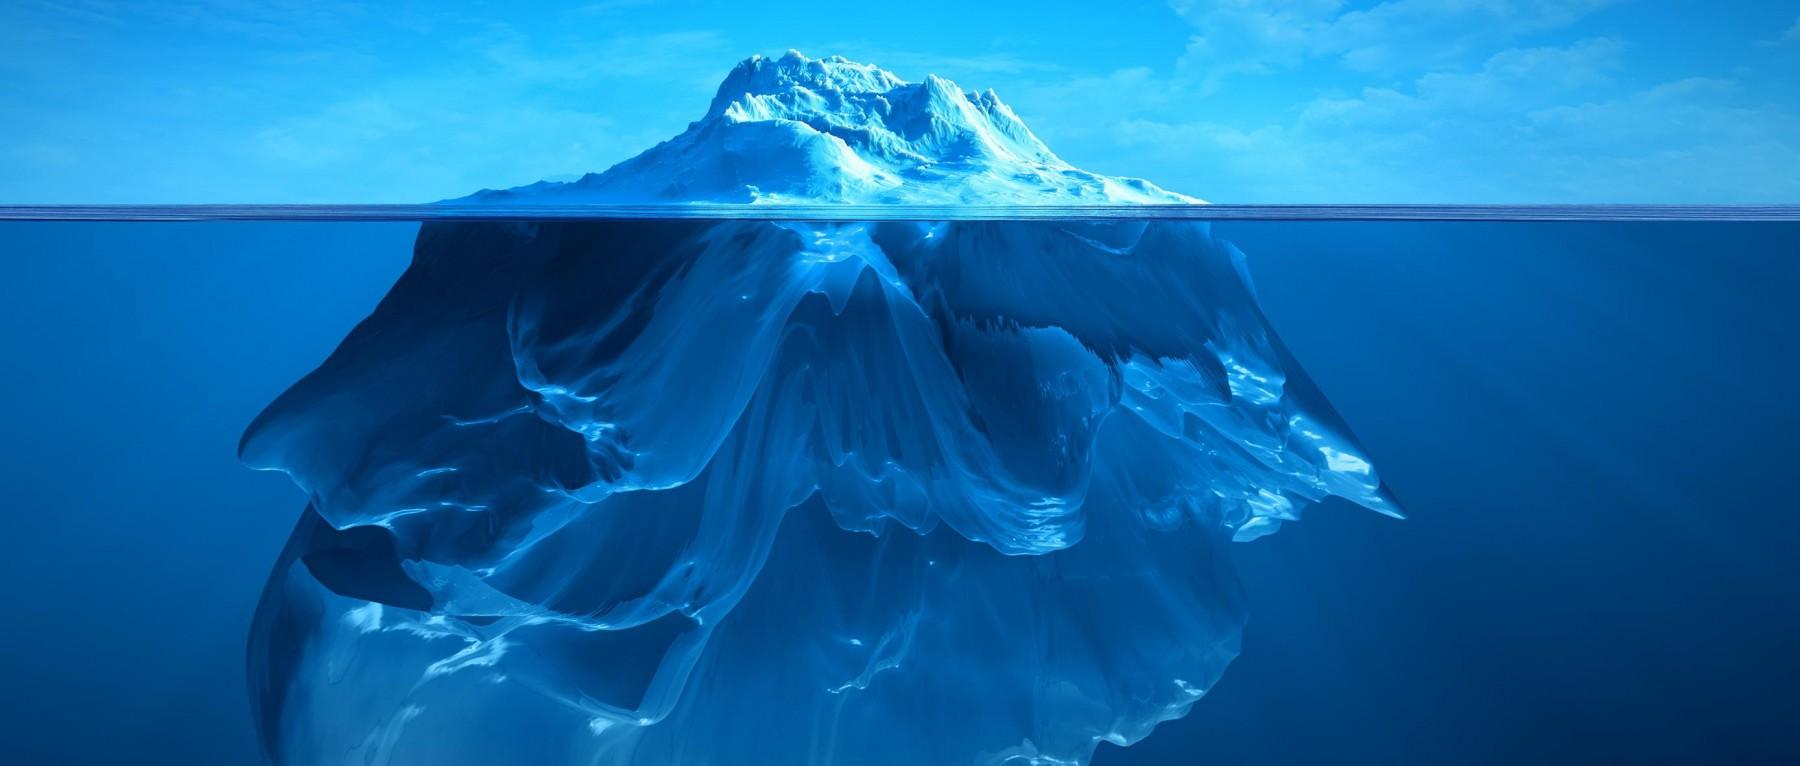 Image-iceberg-e1456497375929